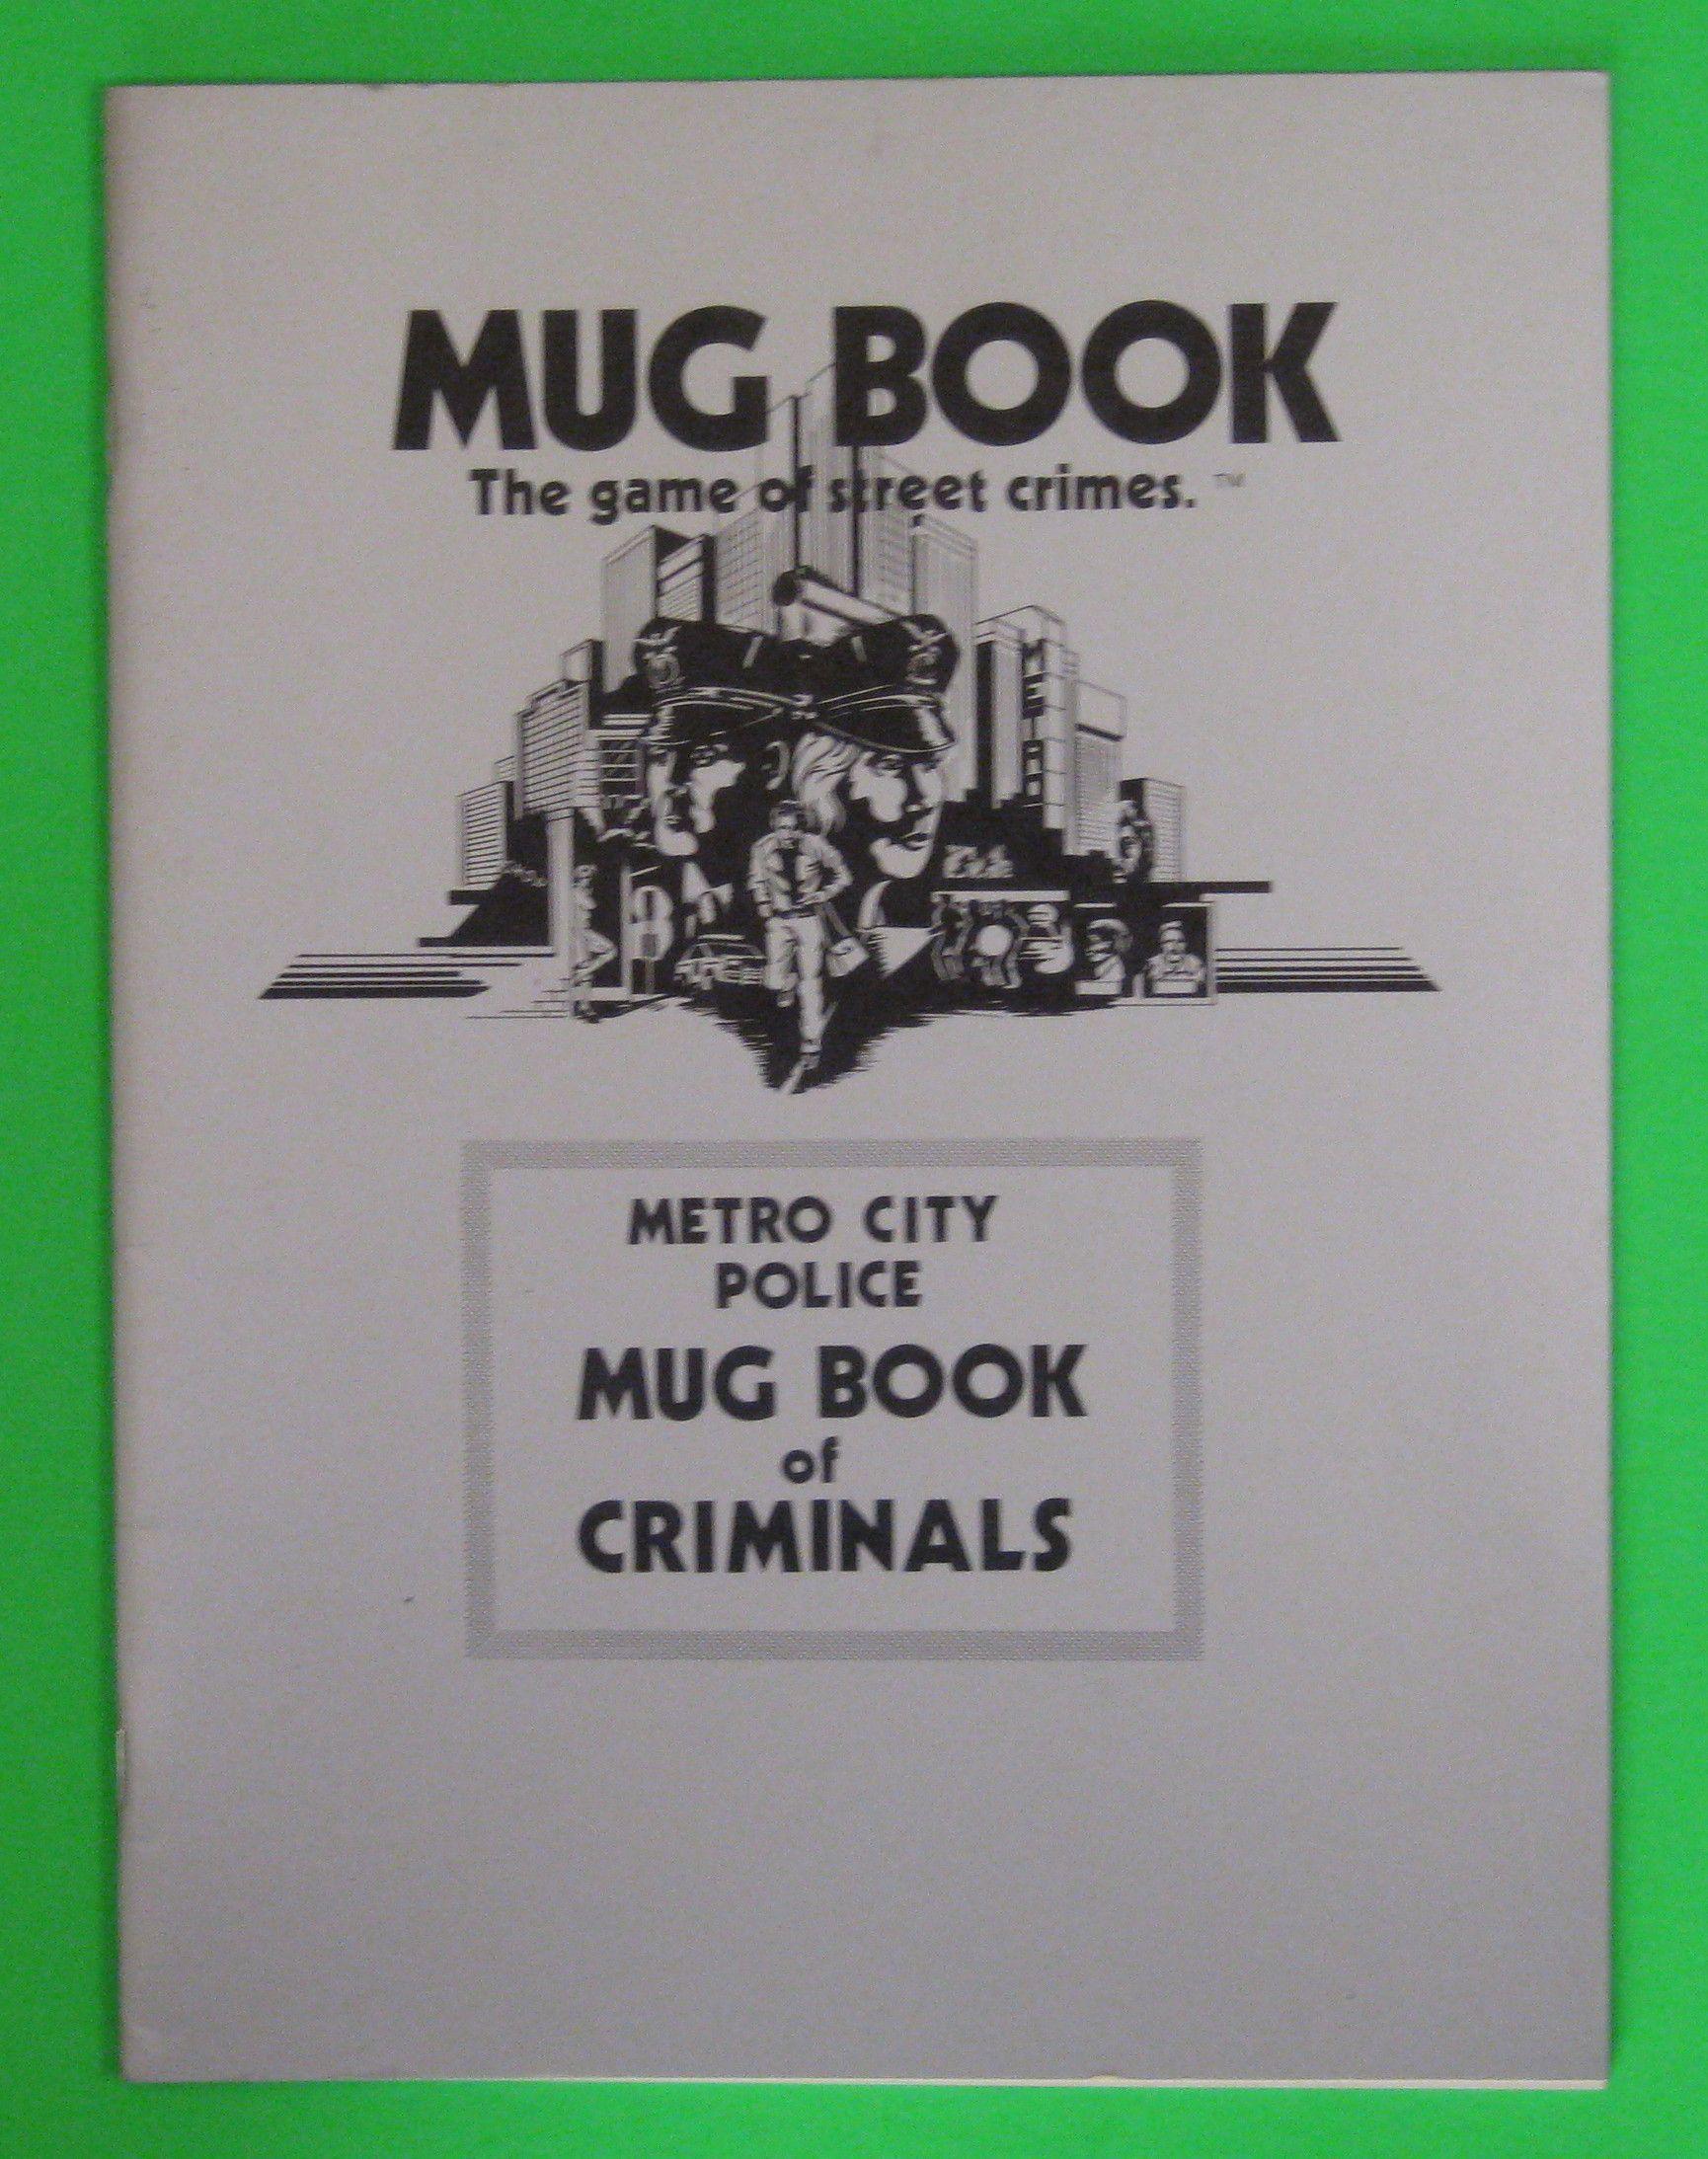 Mug Book: The Game of Street Crimes